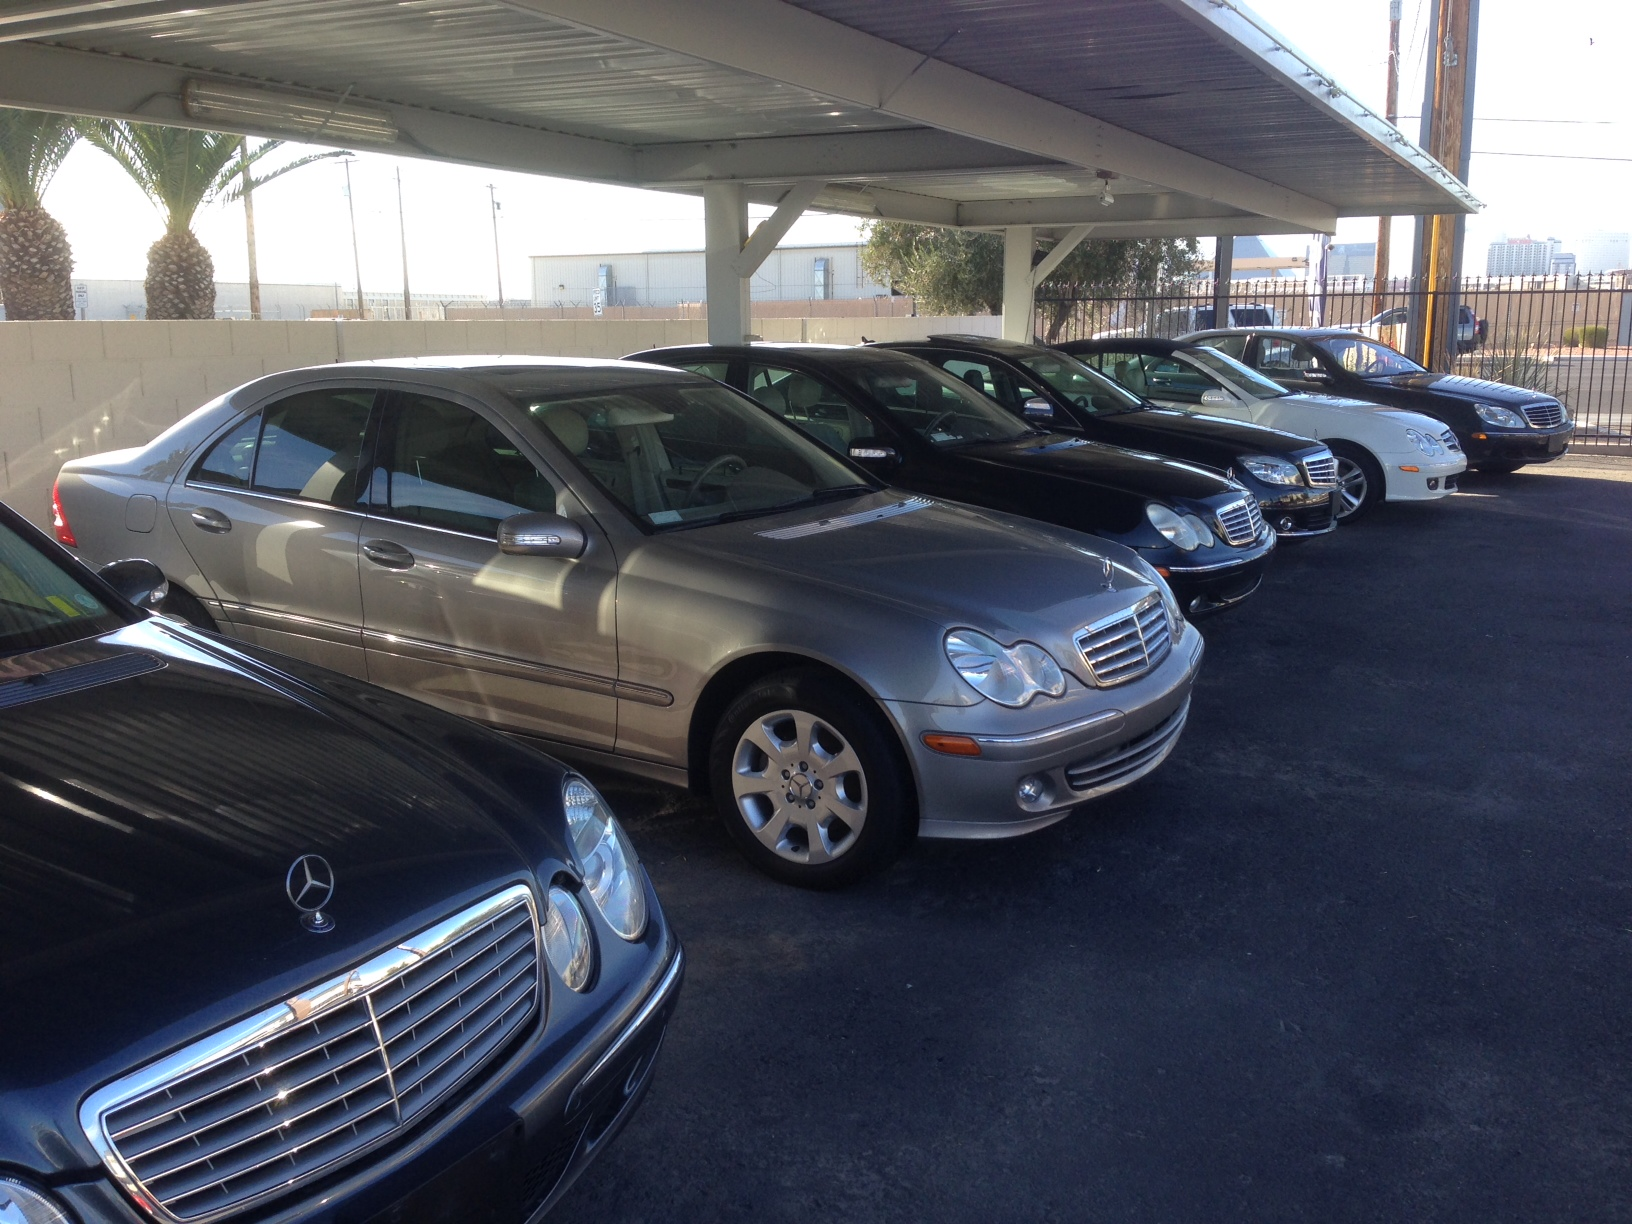 Cartwright motors in las vegas nv 702 476 6867 for Chicago motor cars las vegas nv